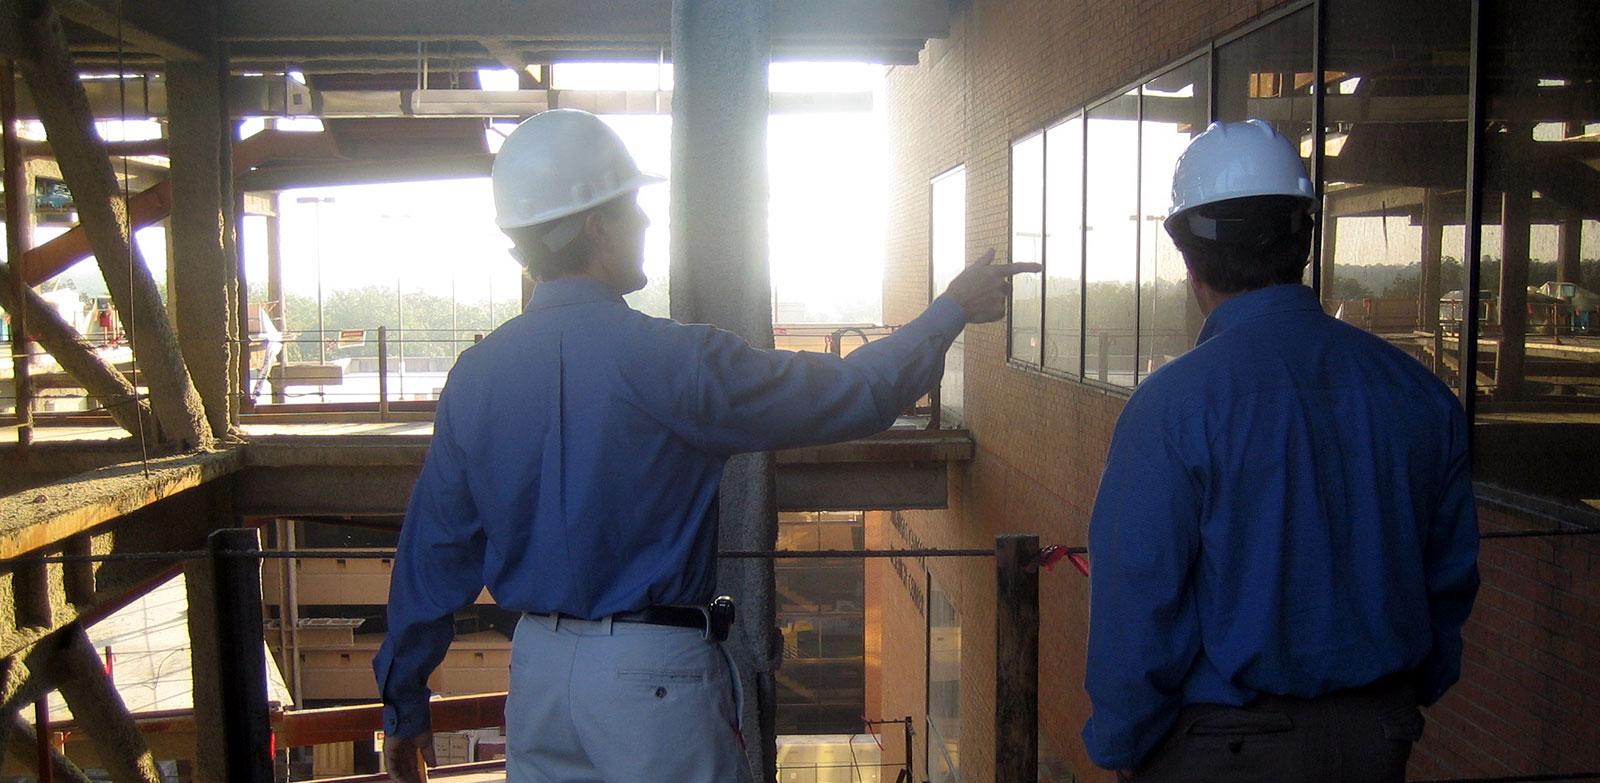 UAMS Construction